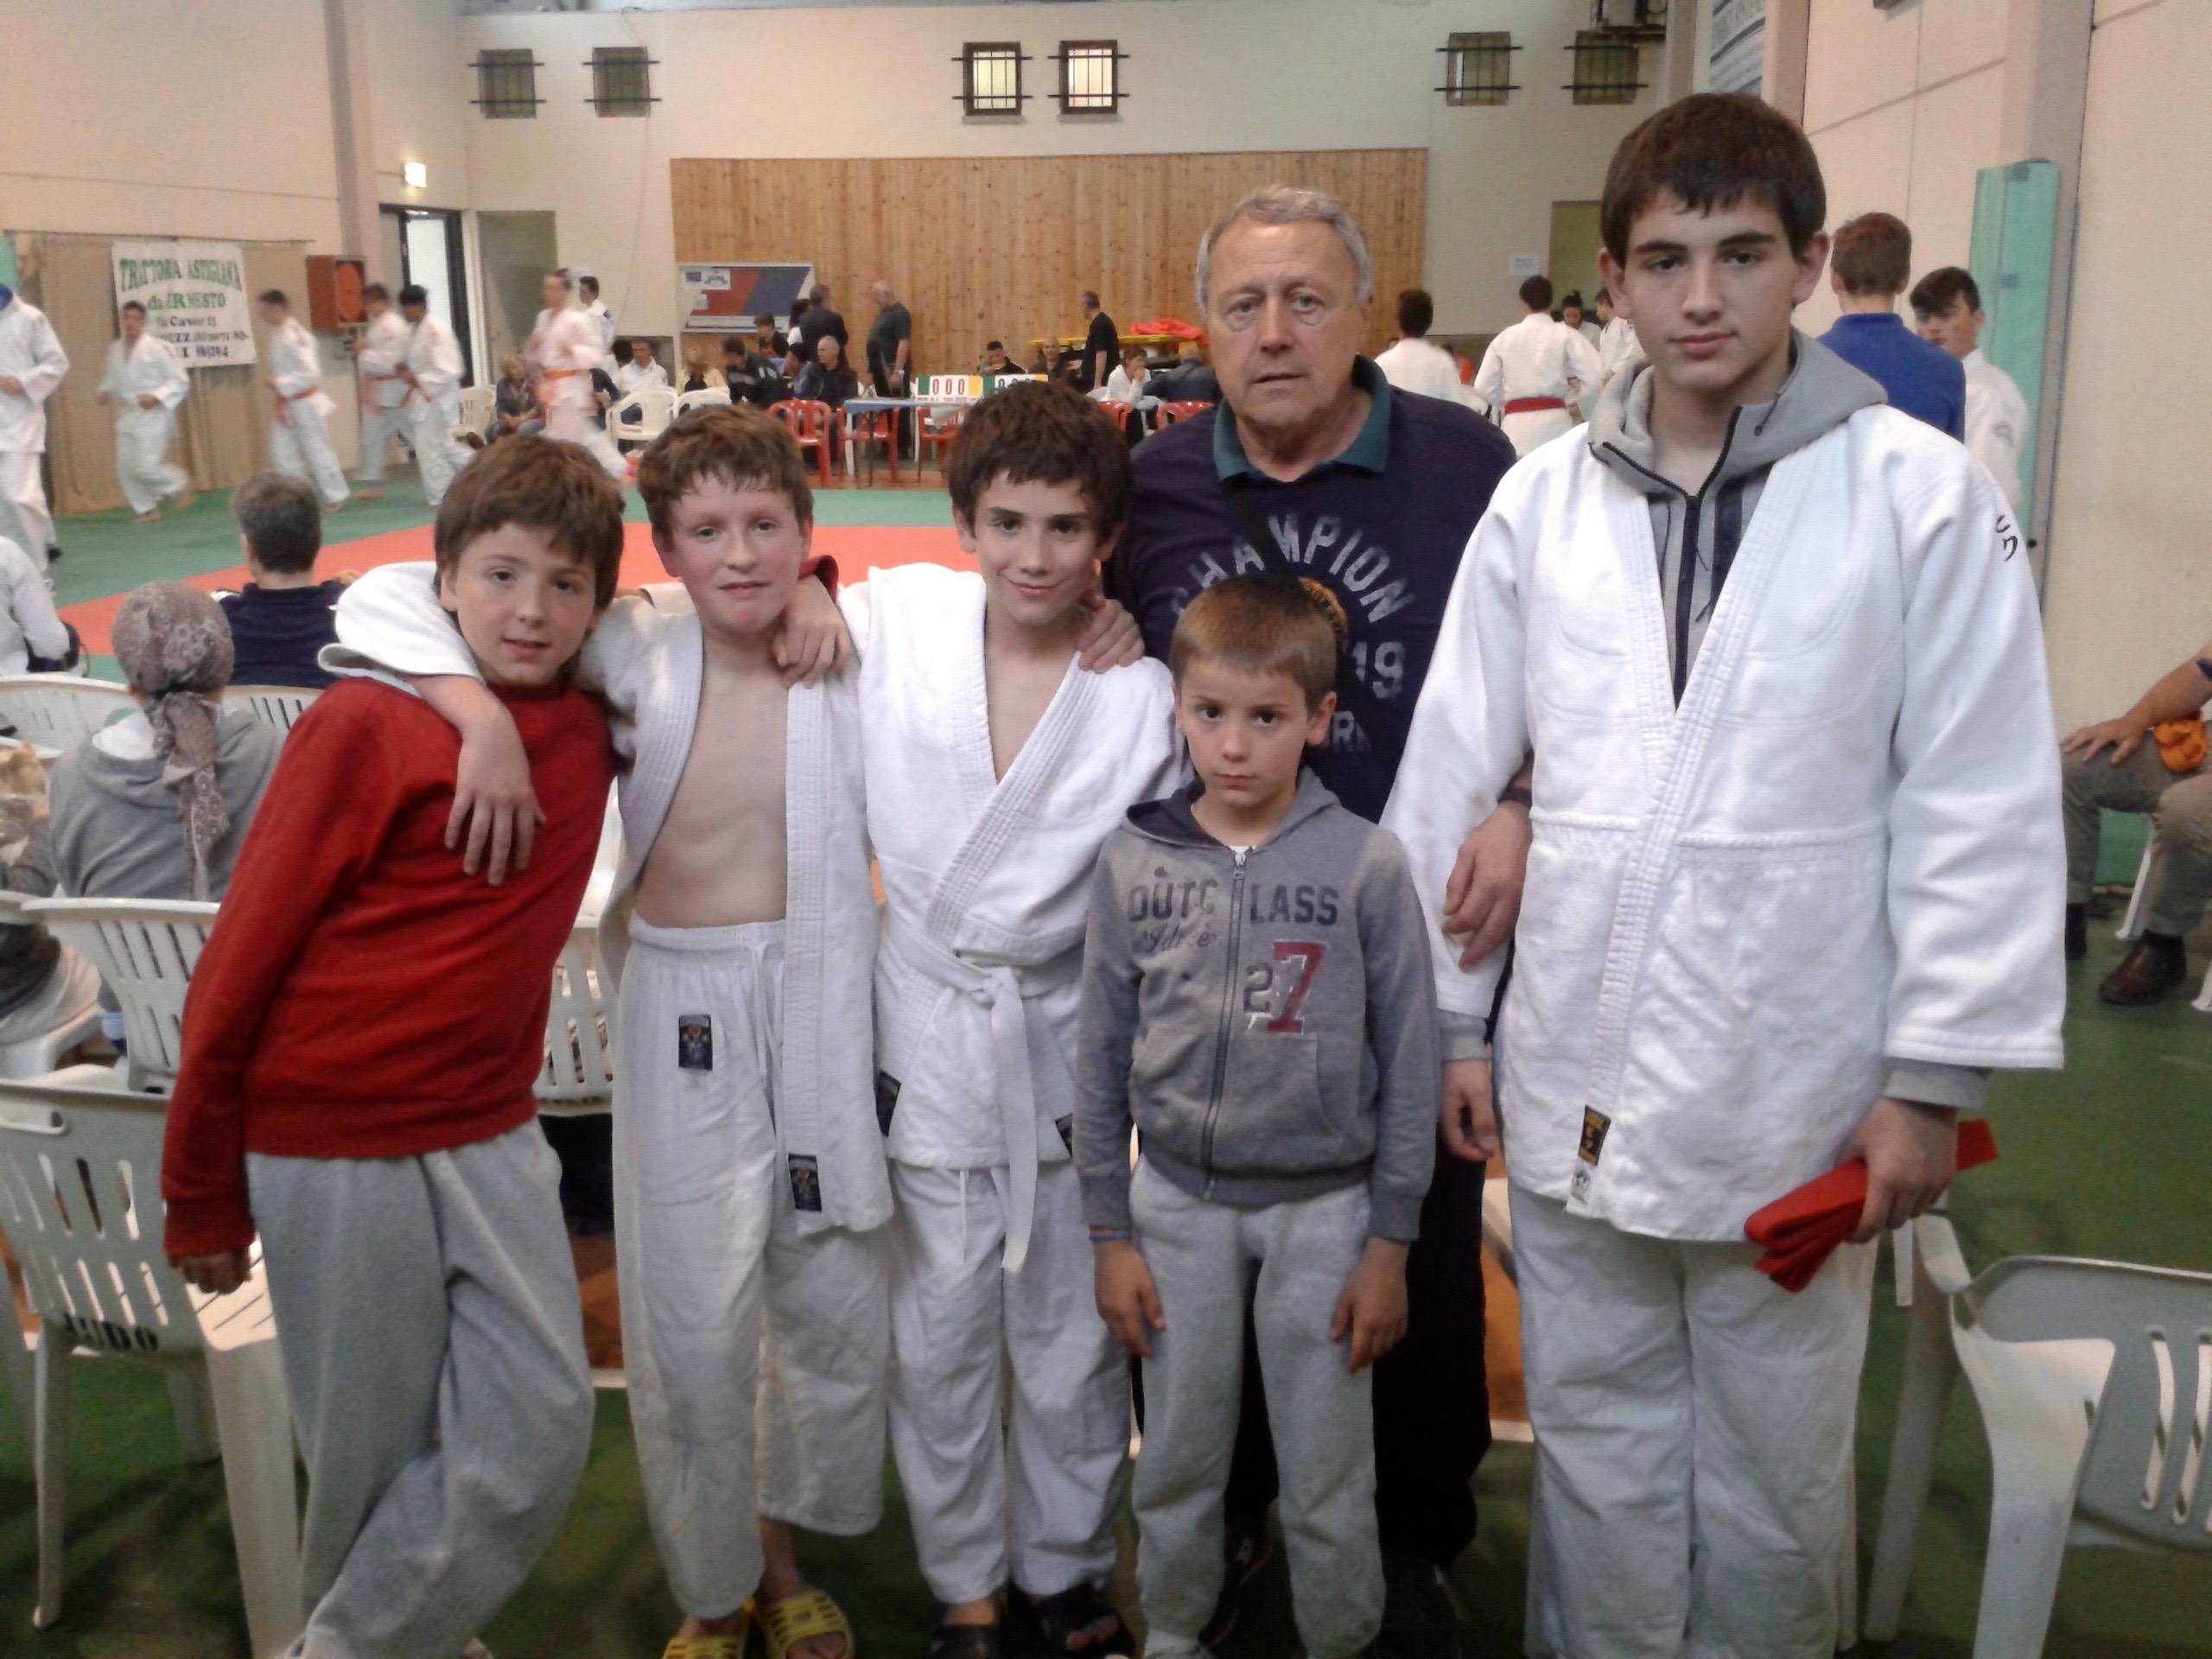 Judoka a Novara +spazioforma biella